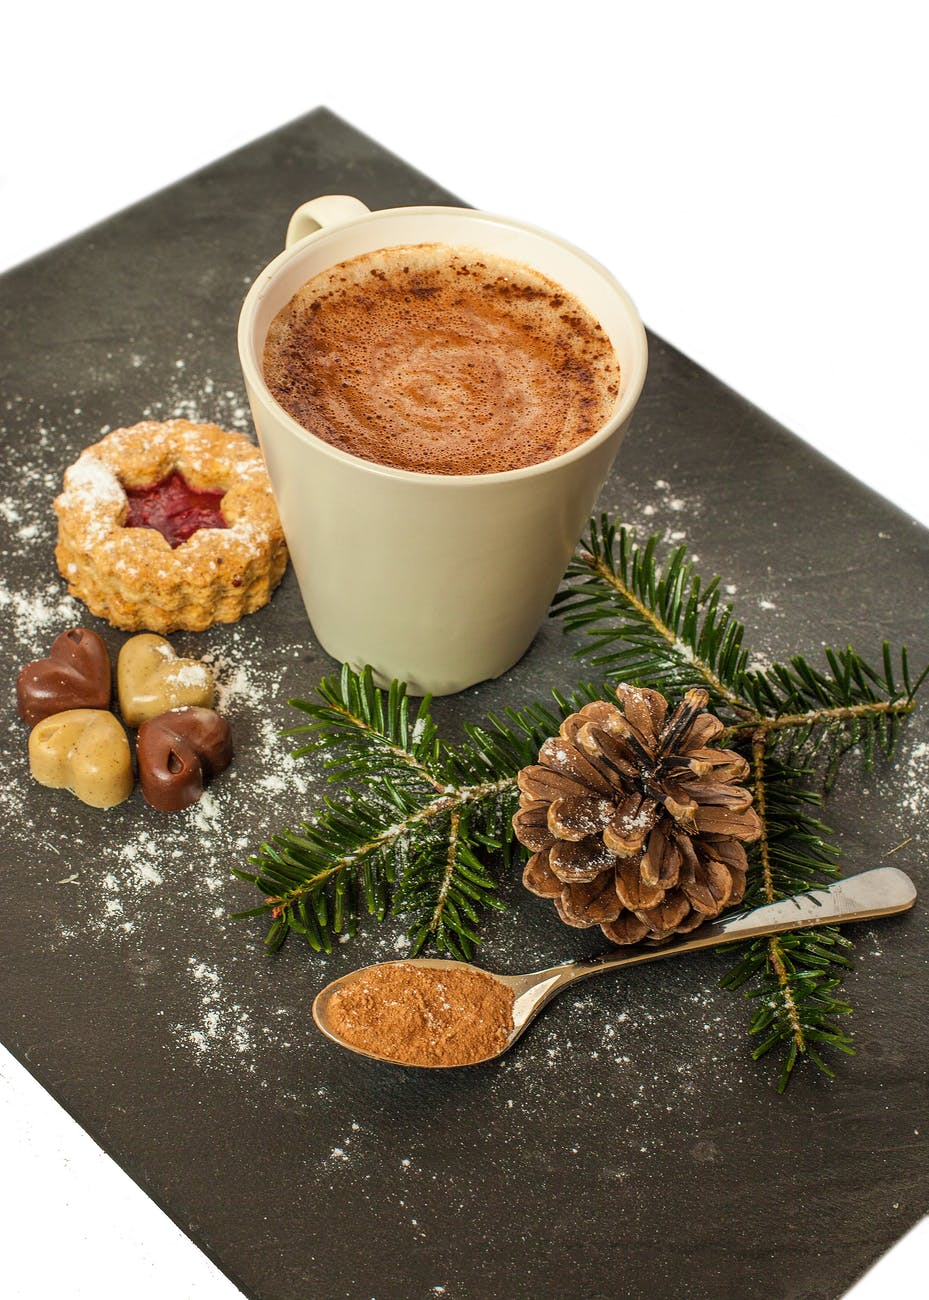 white ceramic mug with brown liquid and pine cone